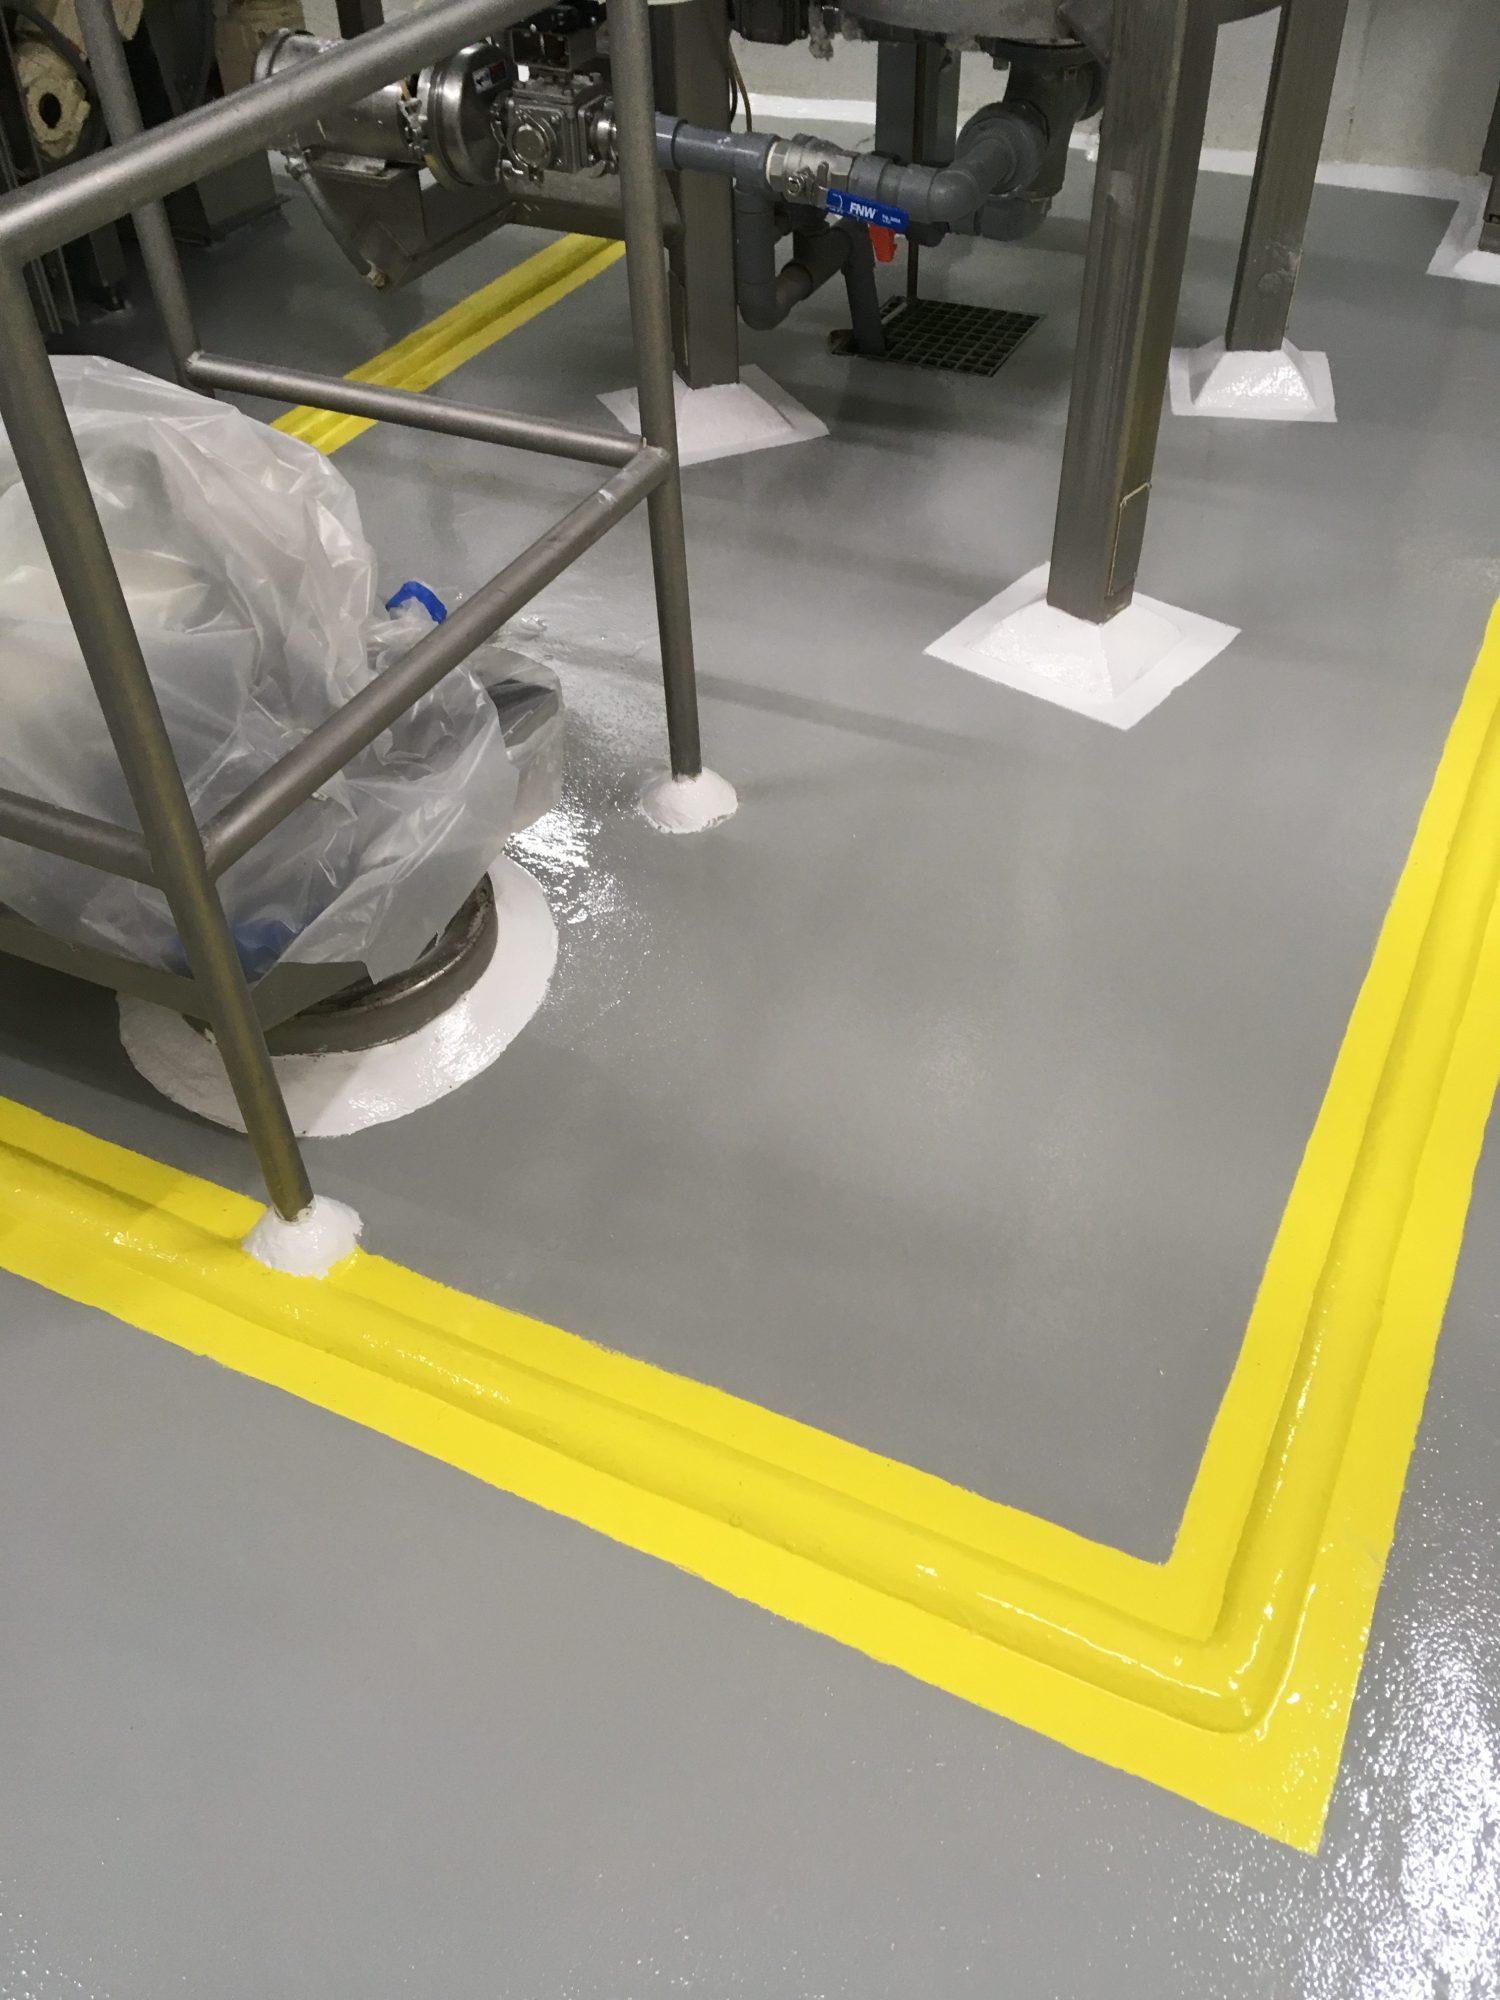 epoxy floor coating, concrete floor coatings, food and beverage floor coatings, USDA floor coatings, line striping, epoxy line striping